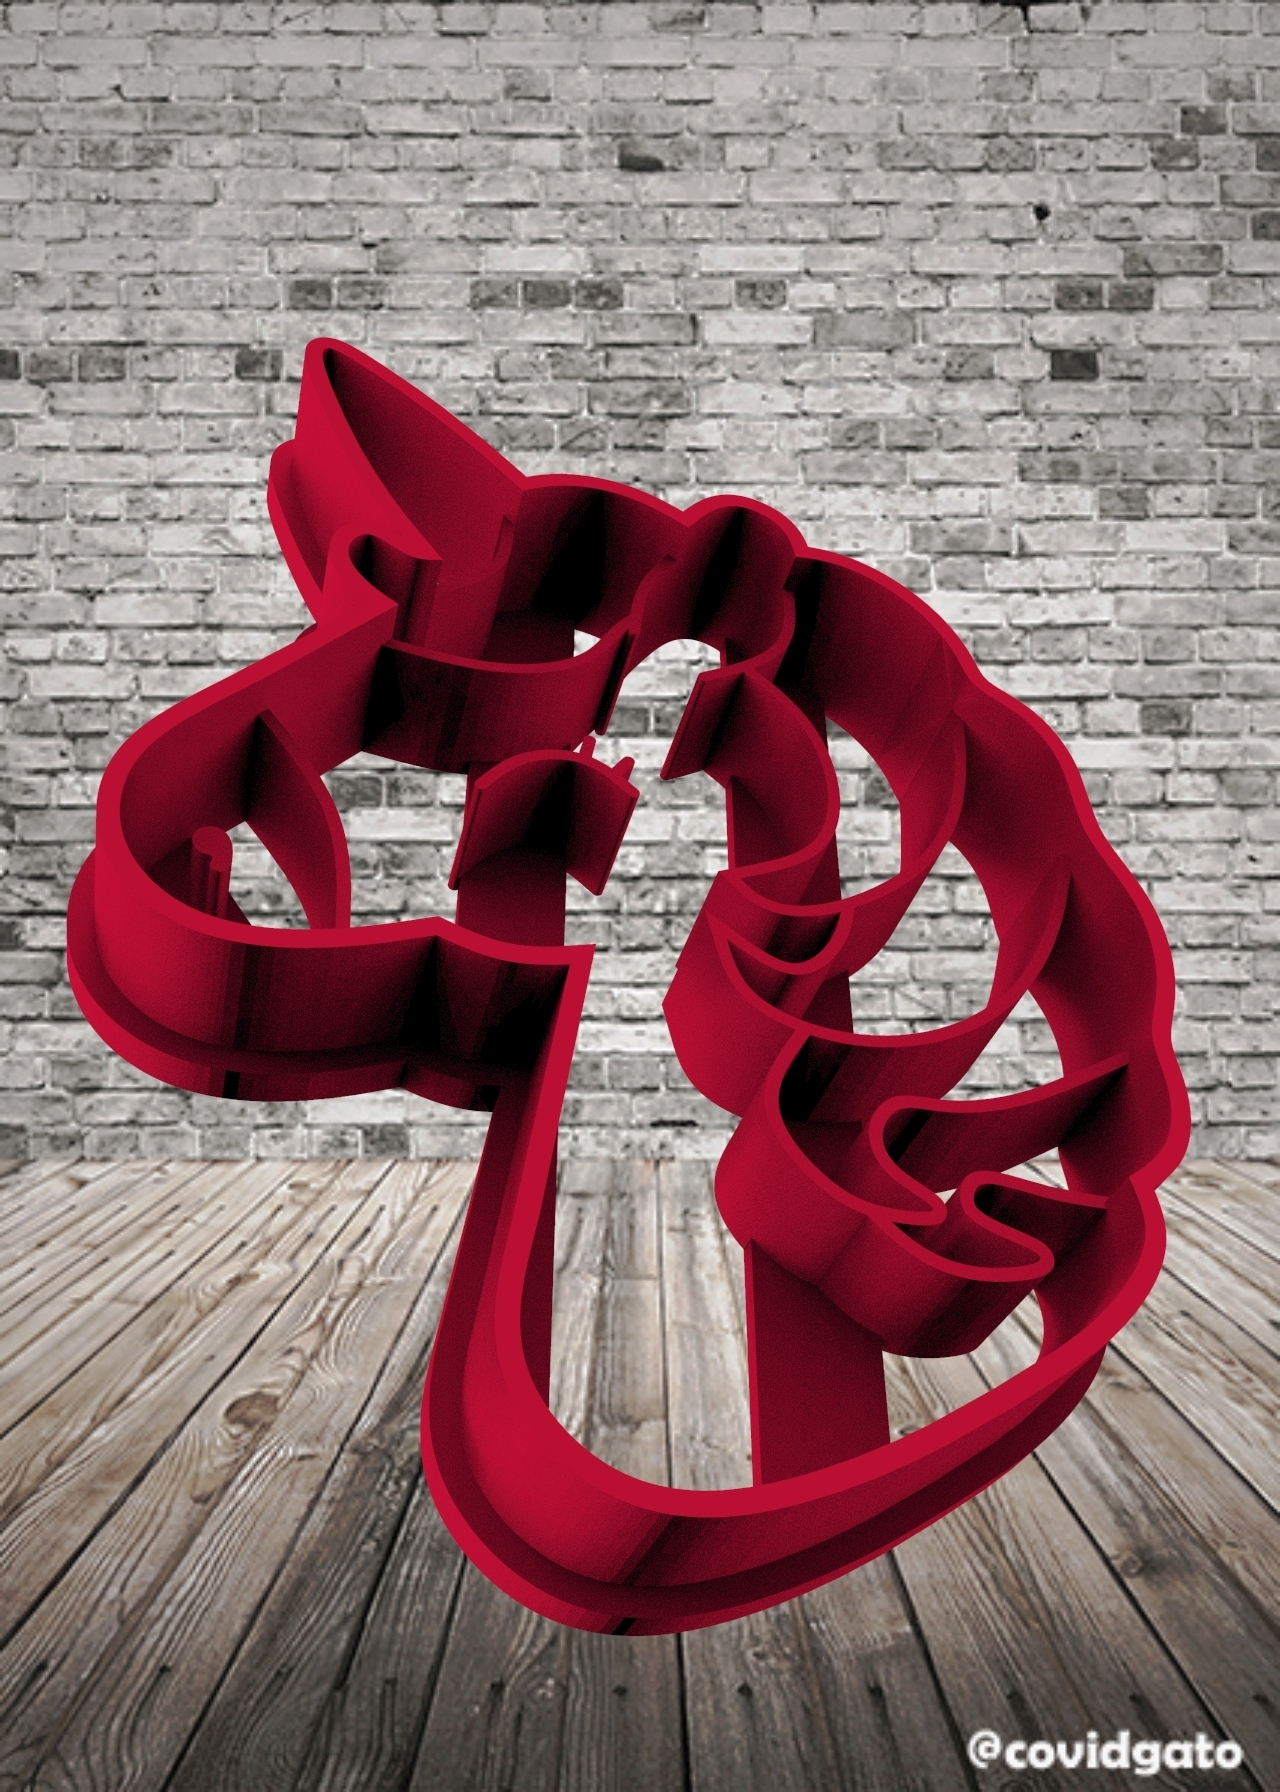 untitled.142.jpg Download free STL file Unicorns - Unicorn • 3D printing template, covidgato